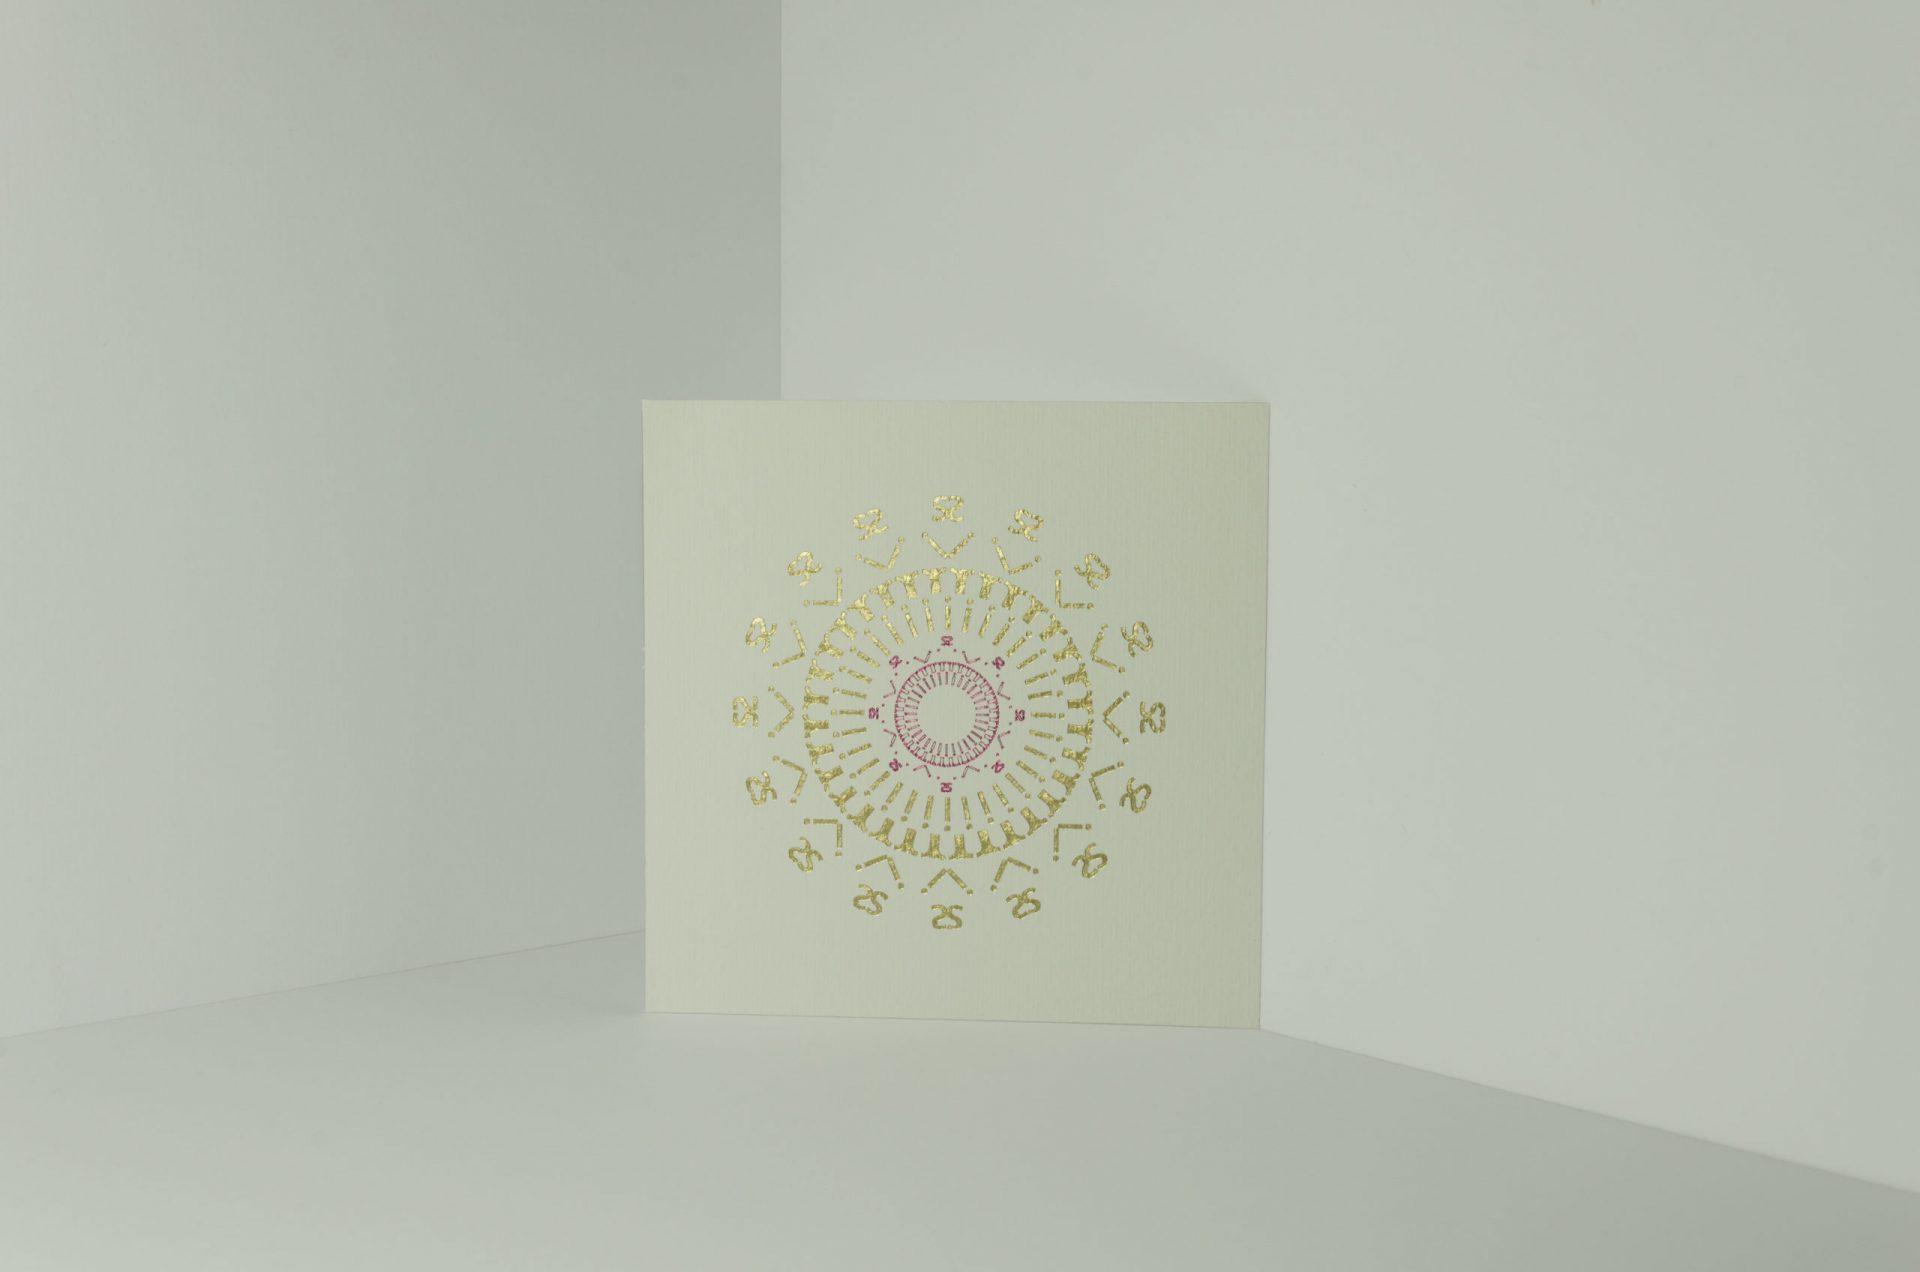 namandala iris // gold // fuchsia // Papier: aqua rau. YOUNIVERSES Atelier für achtsames & spirituelles Design, Herdwangen-Schönach, Pfullendorf, Sigmaringen, Überlingen. Womenhood. Weiblichkeit. Female empowerment.